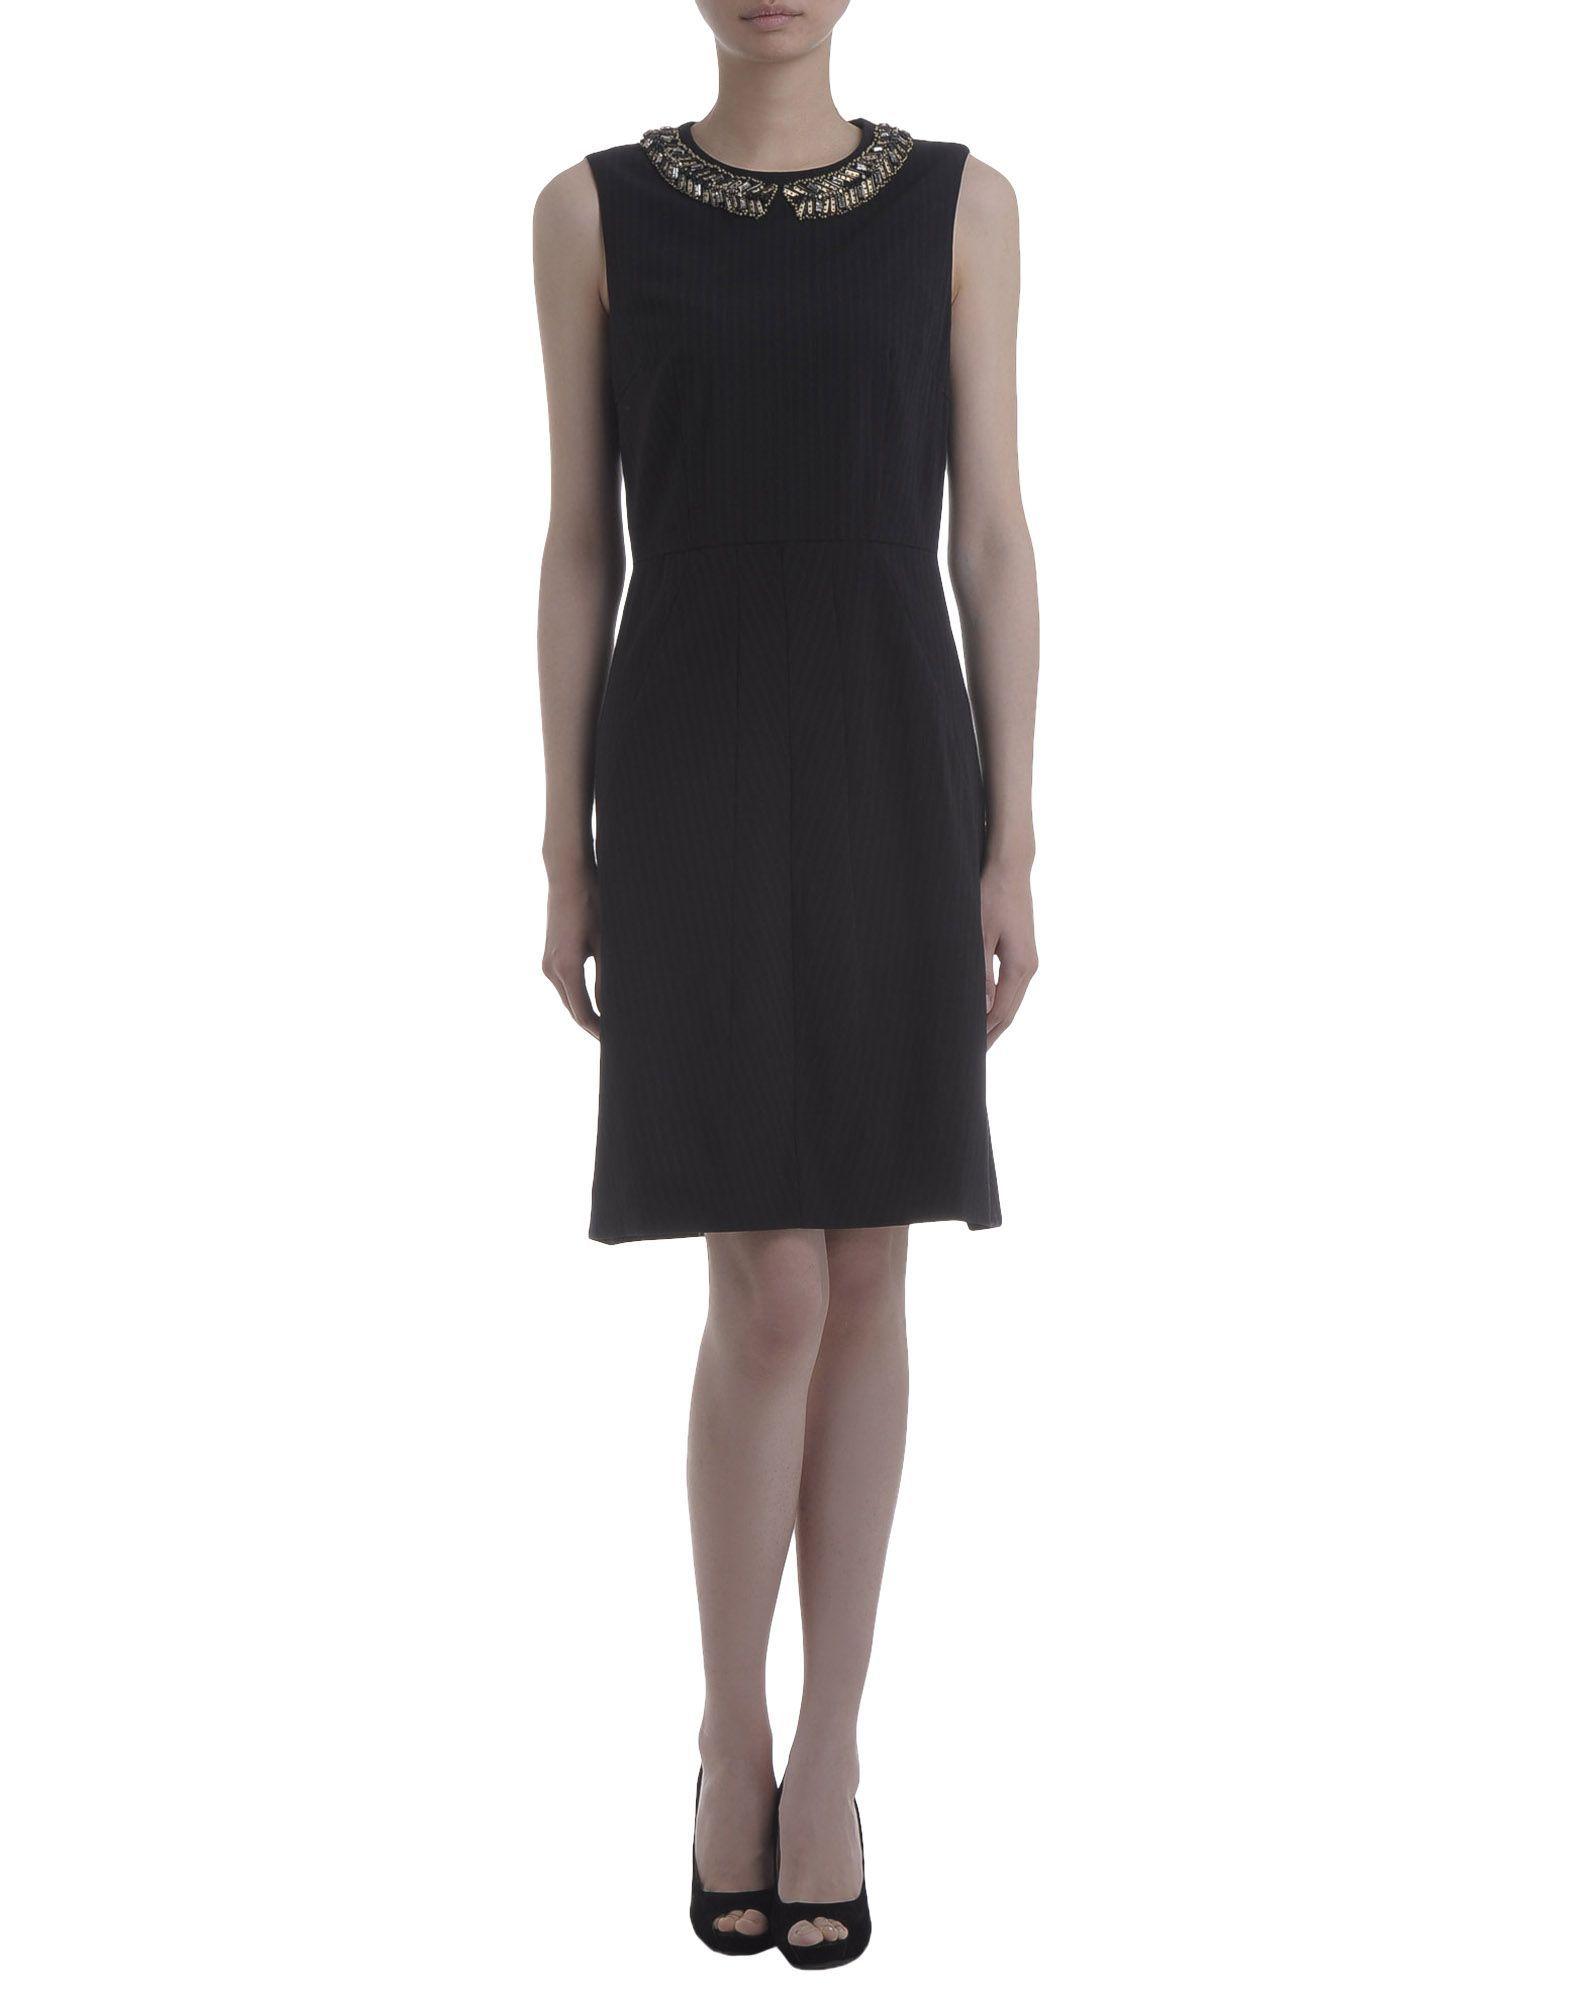 Marni Black Wool Sleeveless Dress